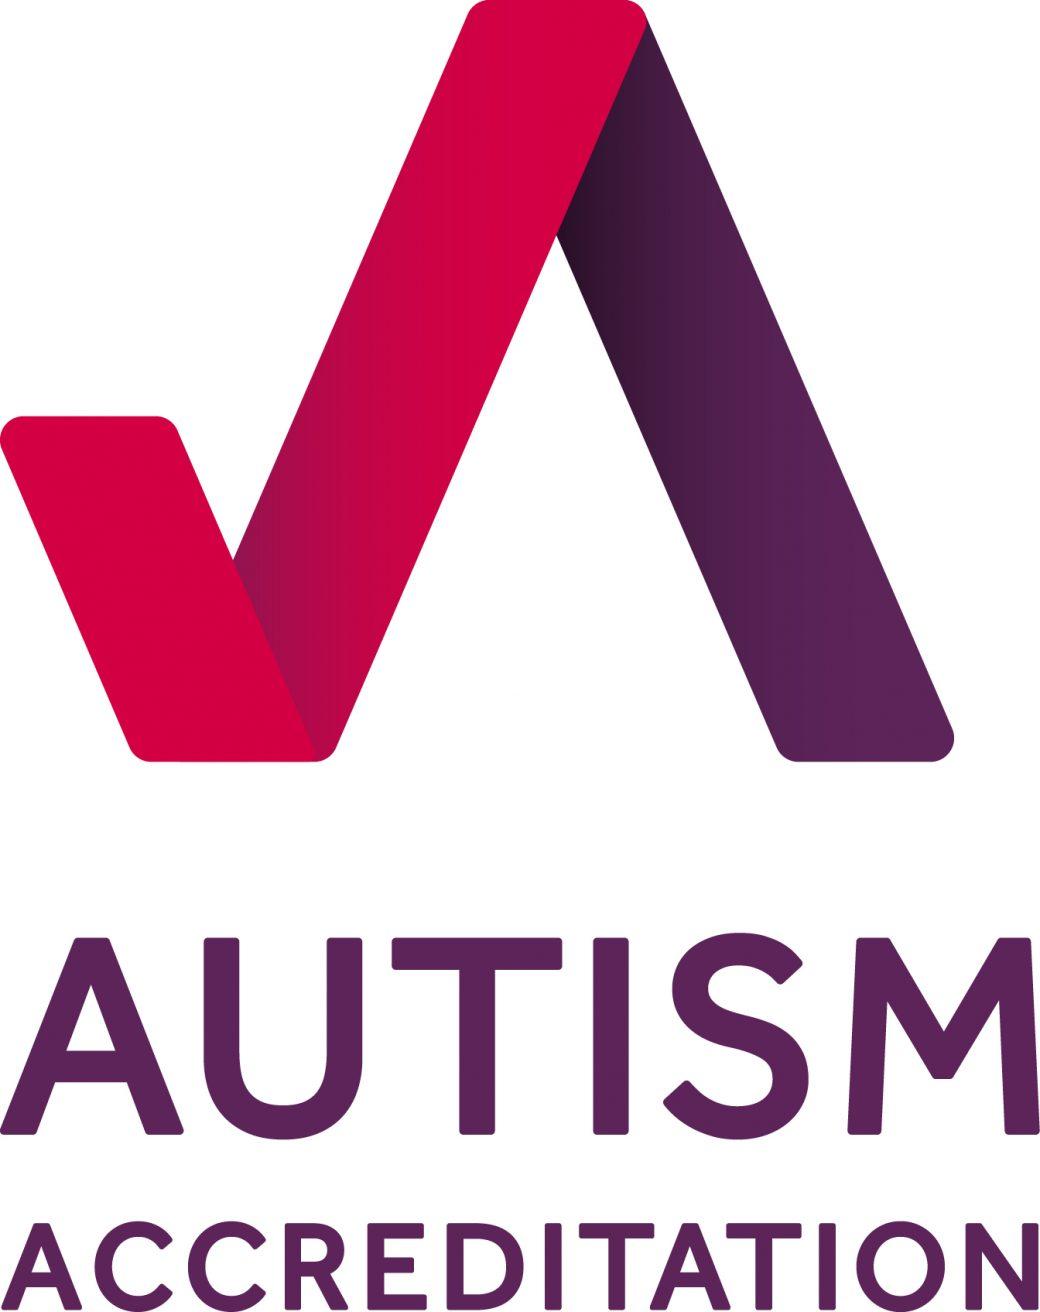 Autism Accreditation badge